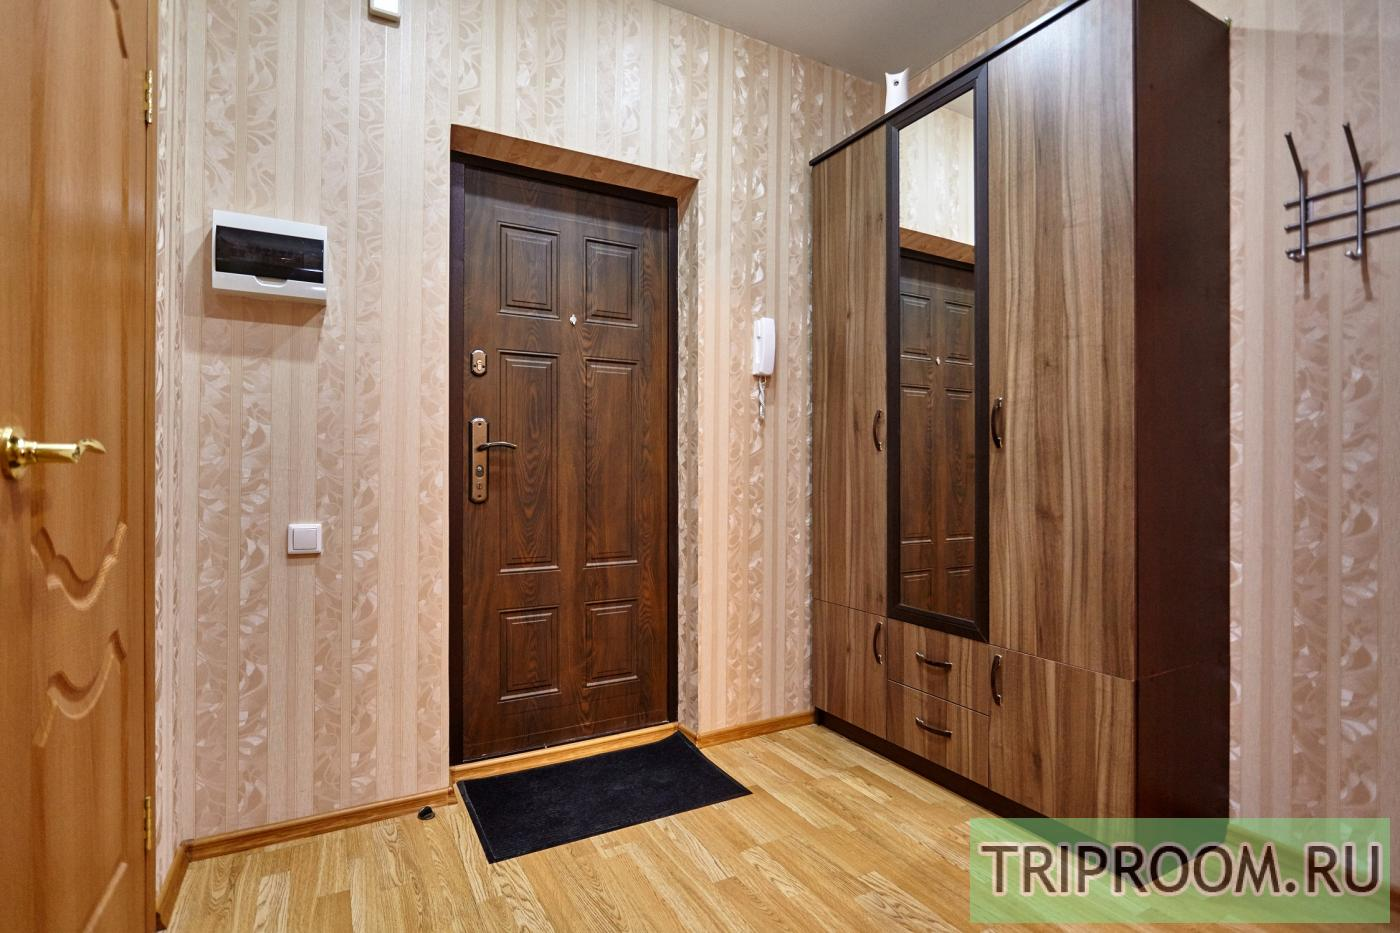 1-комнатная квартира посуточно (вариант № 6860), ул. Соколова улица, фото № 13